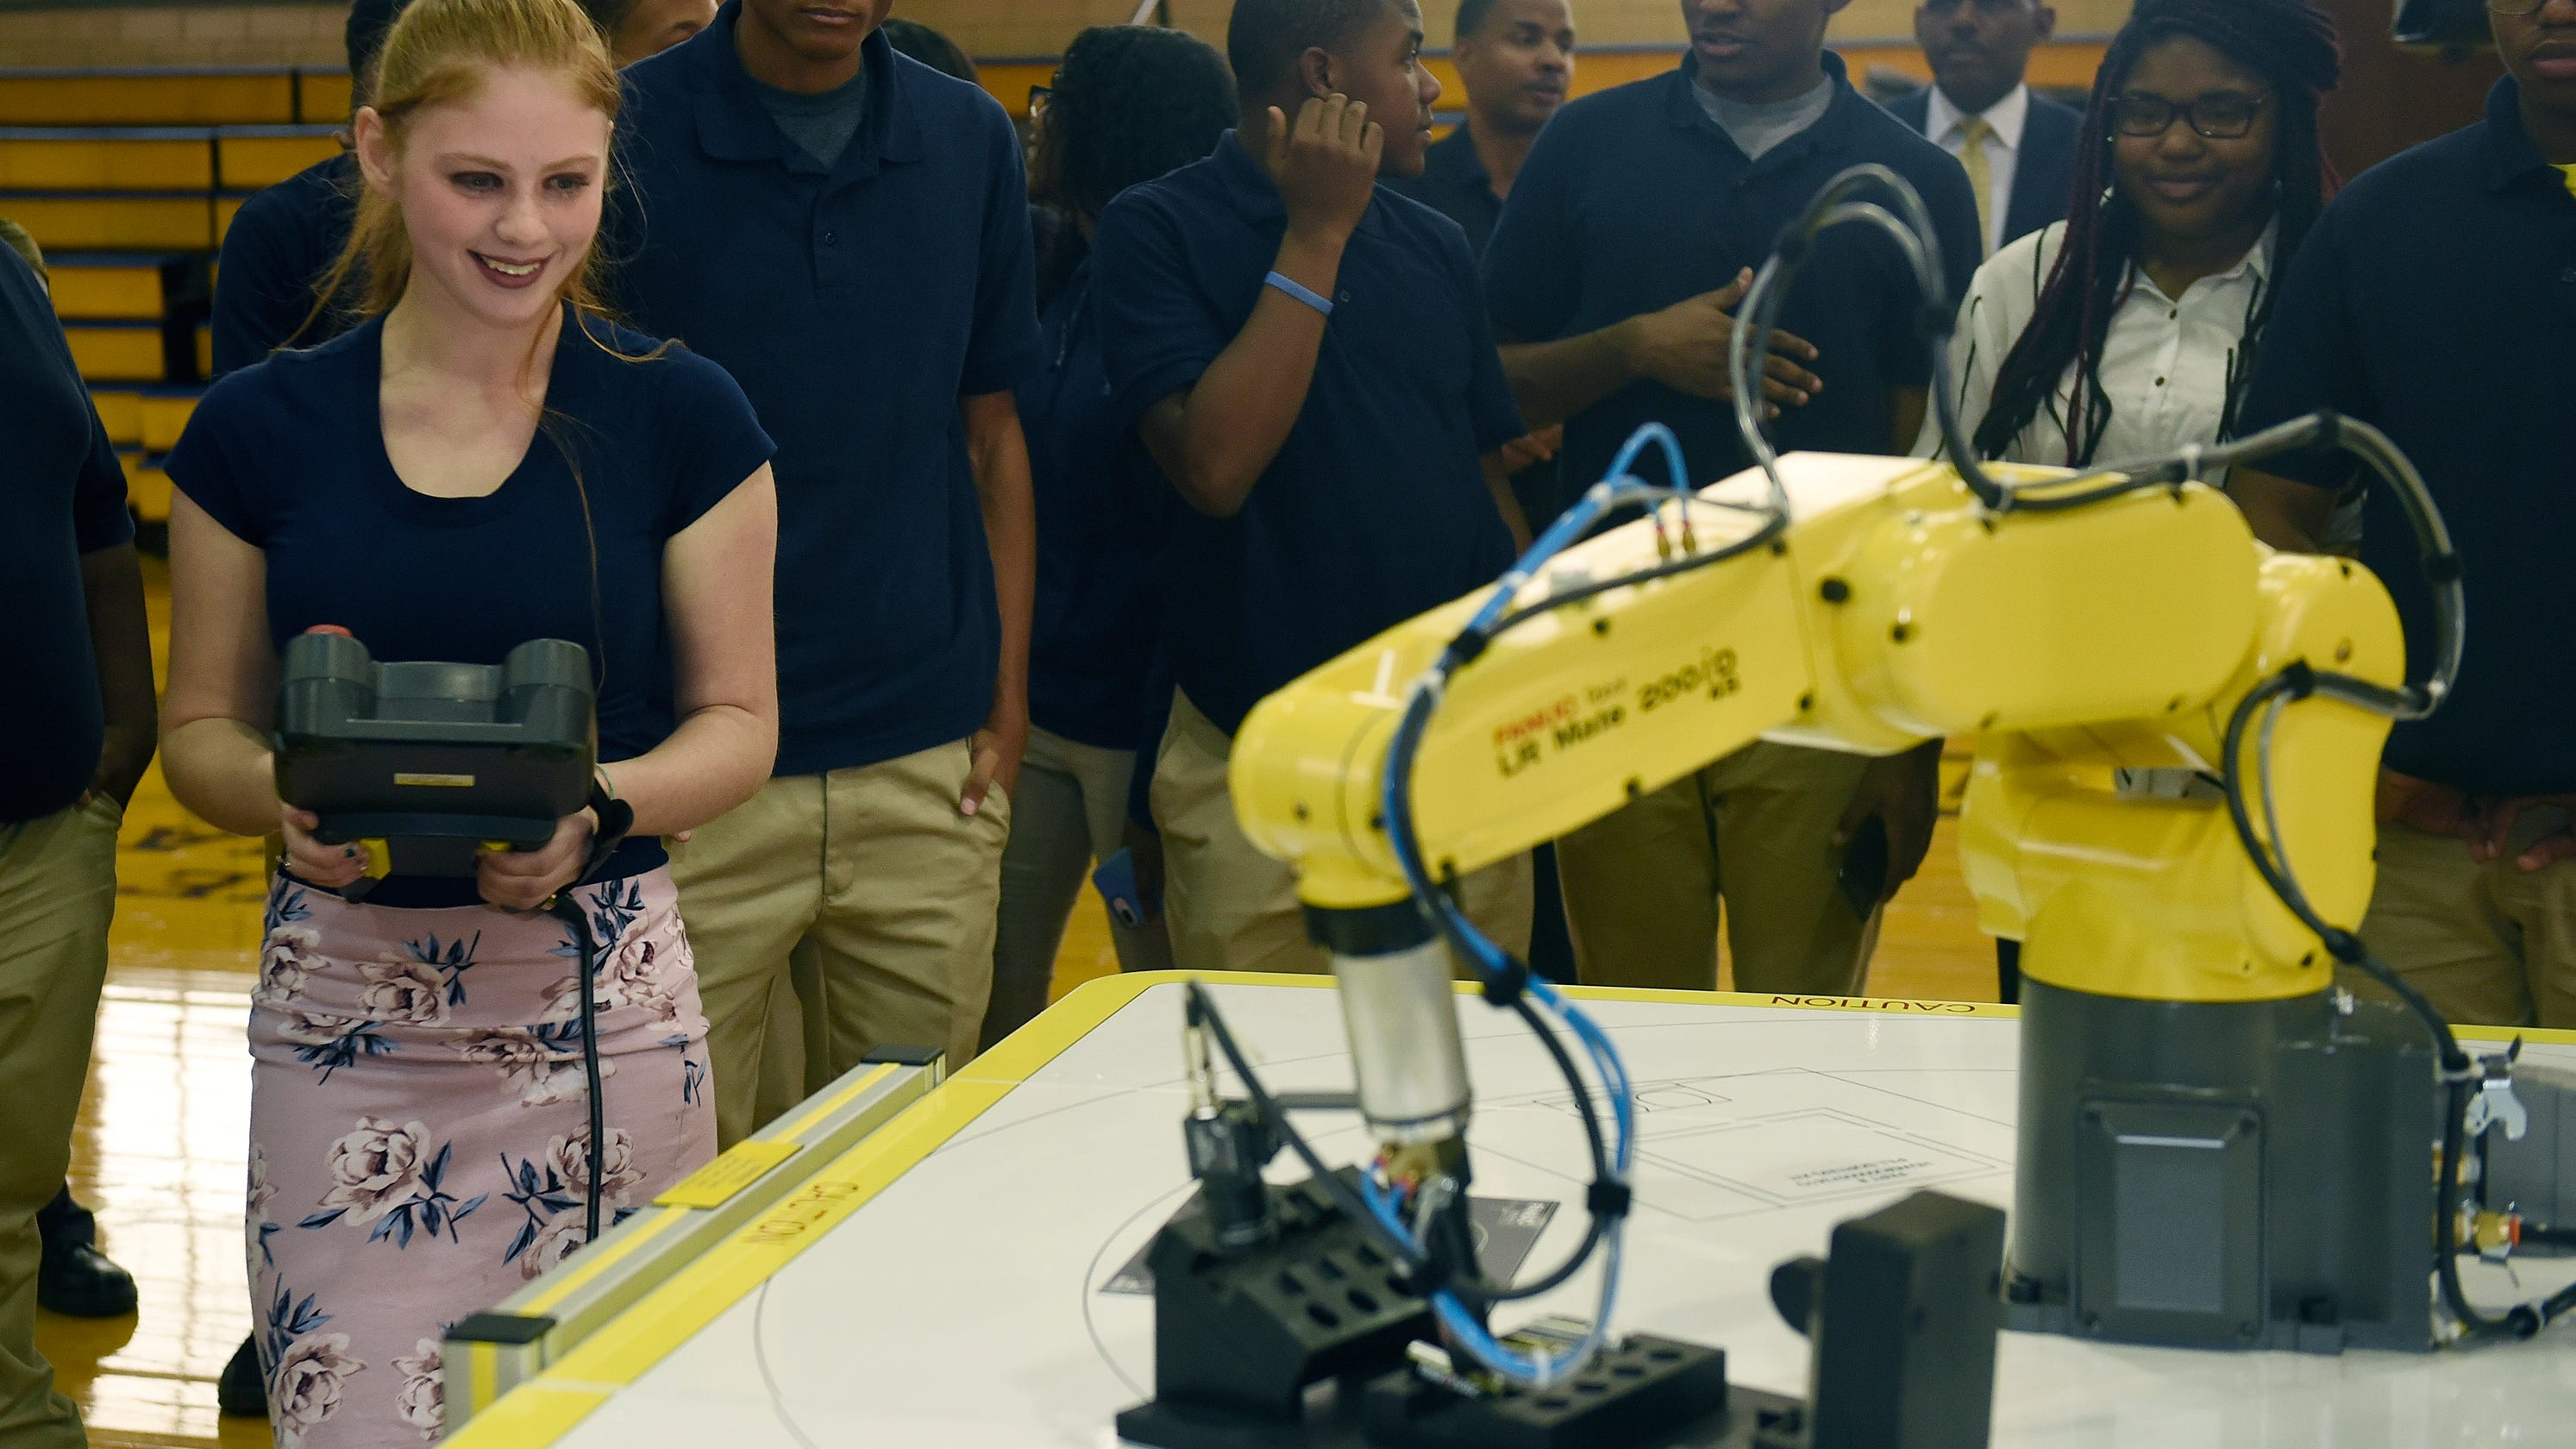 New robotics class launches at two Detroit high schools